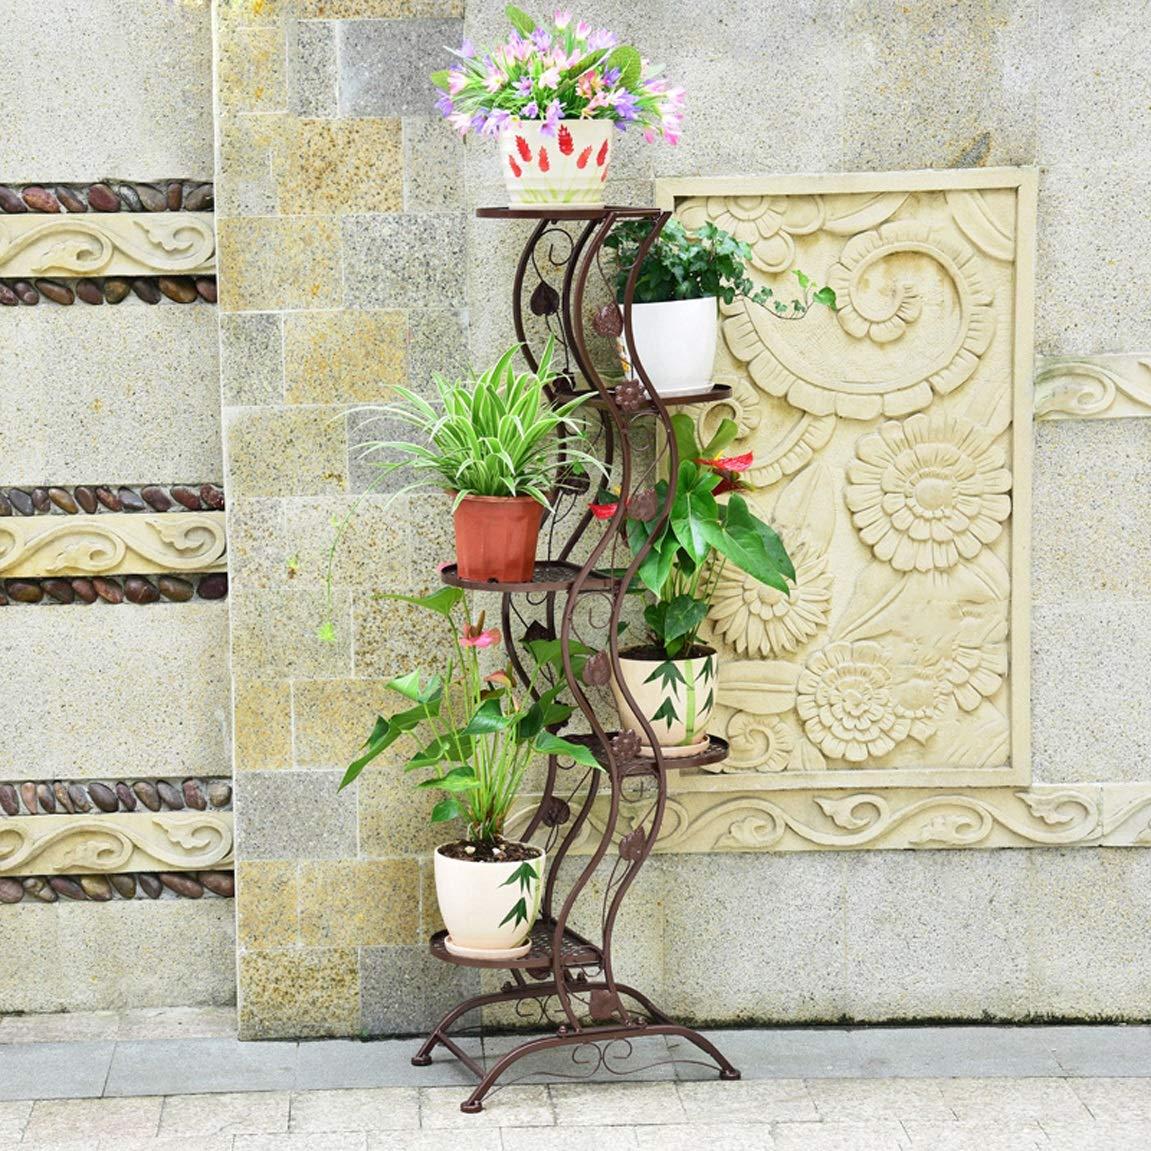 LRW European Flower Rack, Iron Art, Creativity, Green Lace, Chlorophytum, Floor, Multi-Storey Flower Rack Balcony, Fleshy Flower Rack, 5 Layers of Brown.